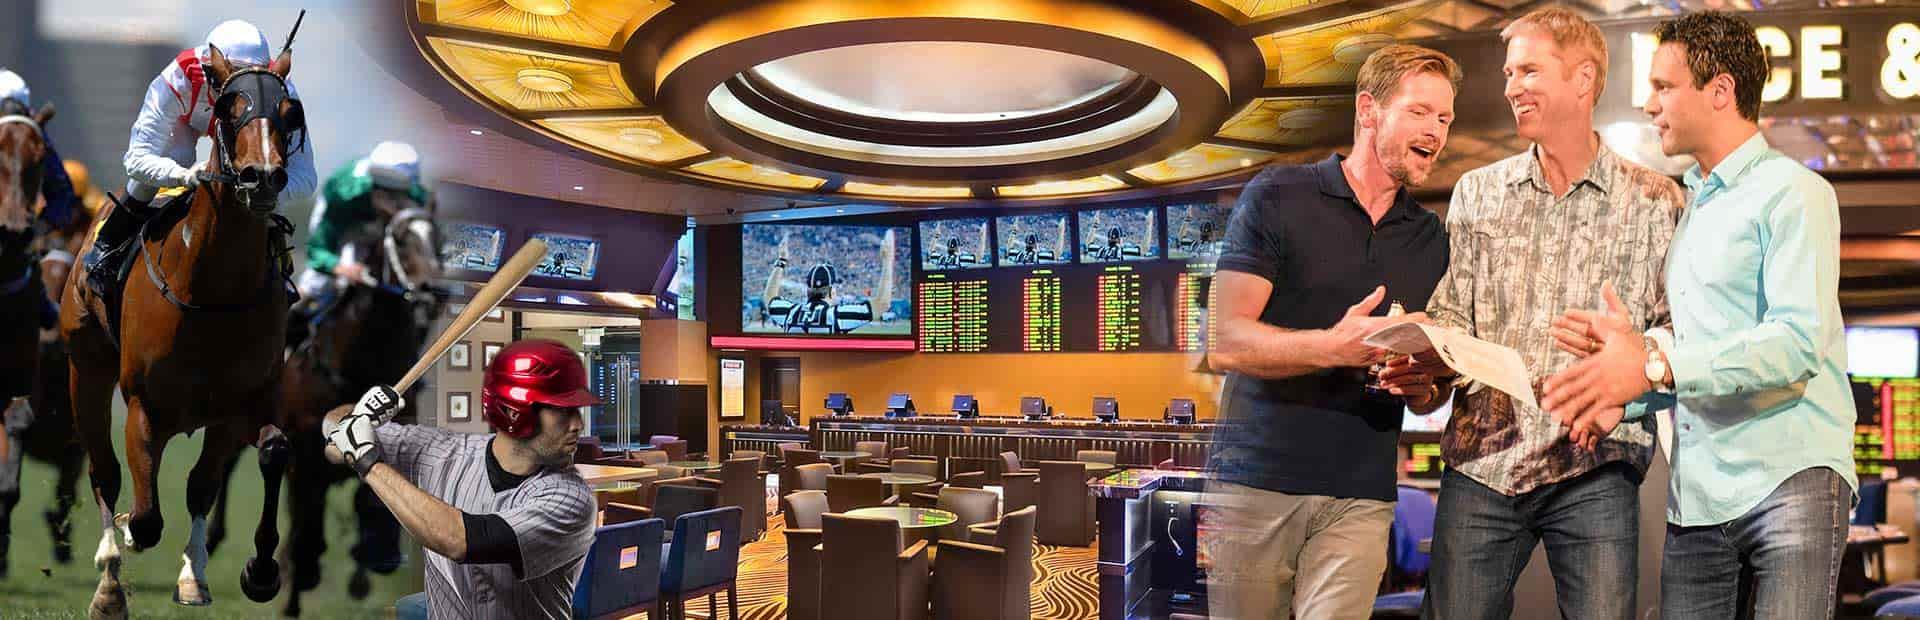 Betting at Atlantis Sportsbook